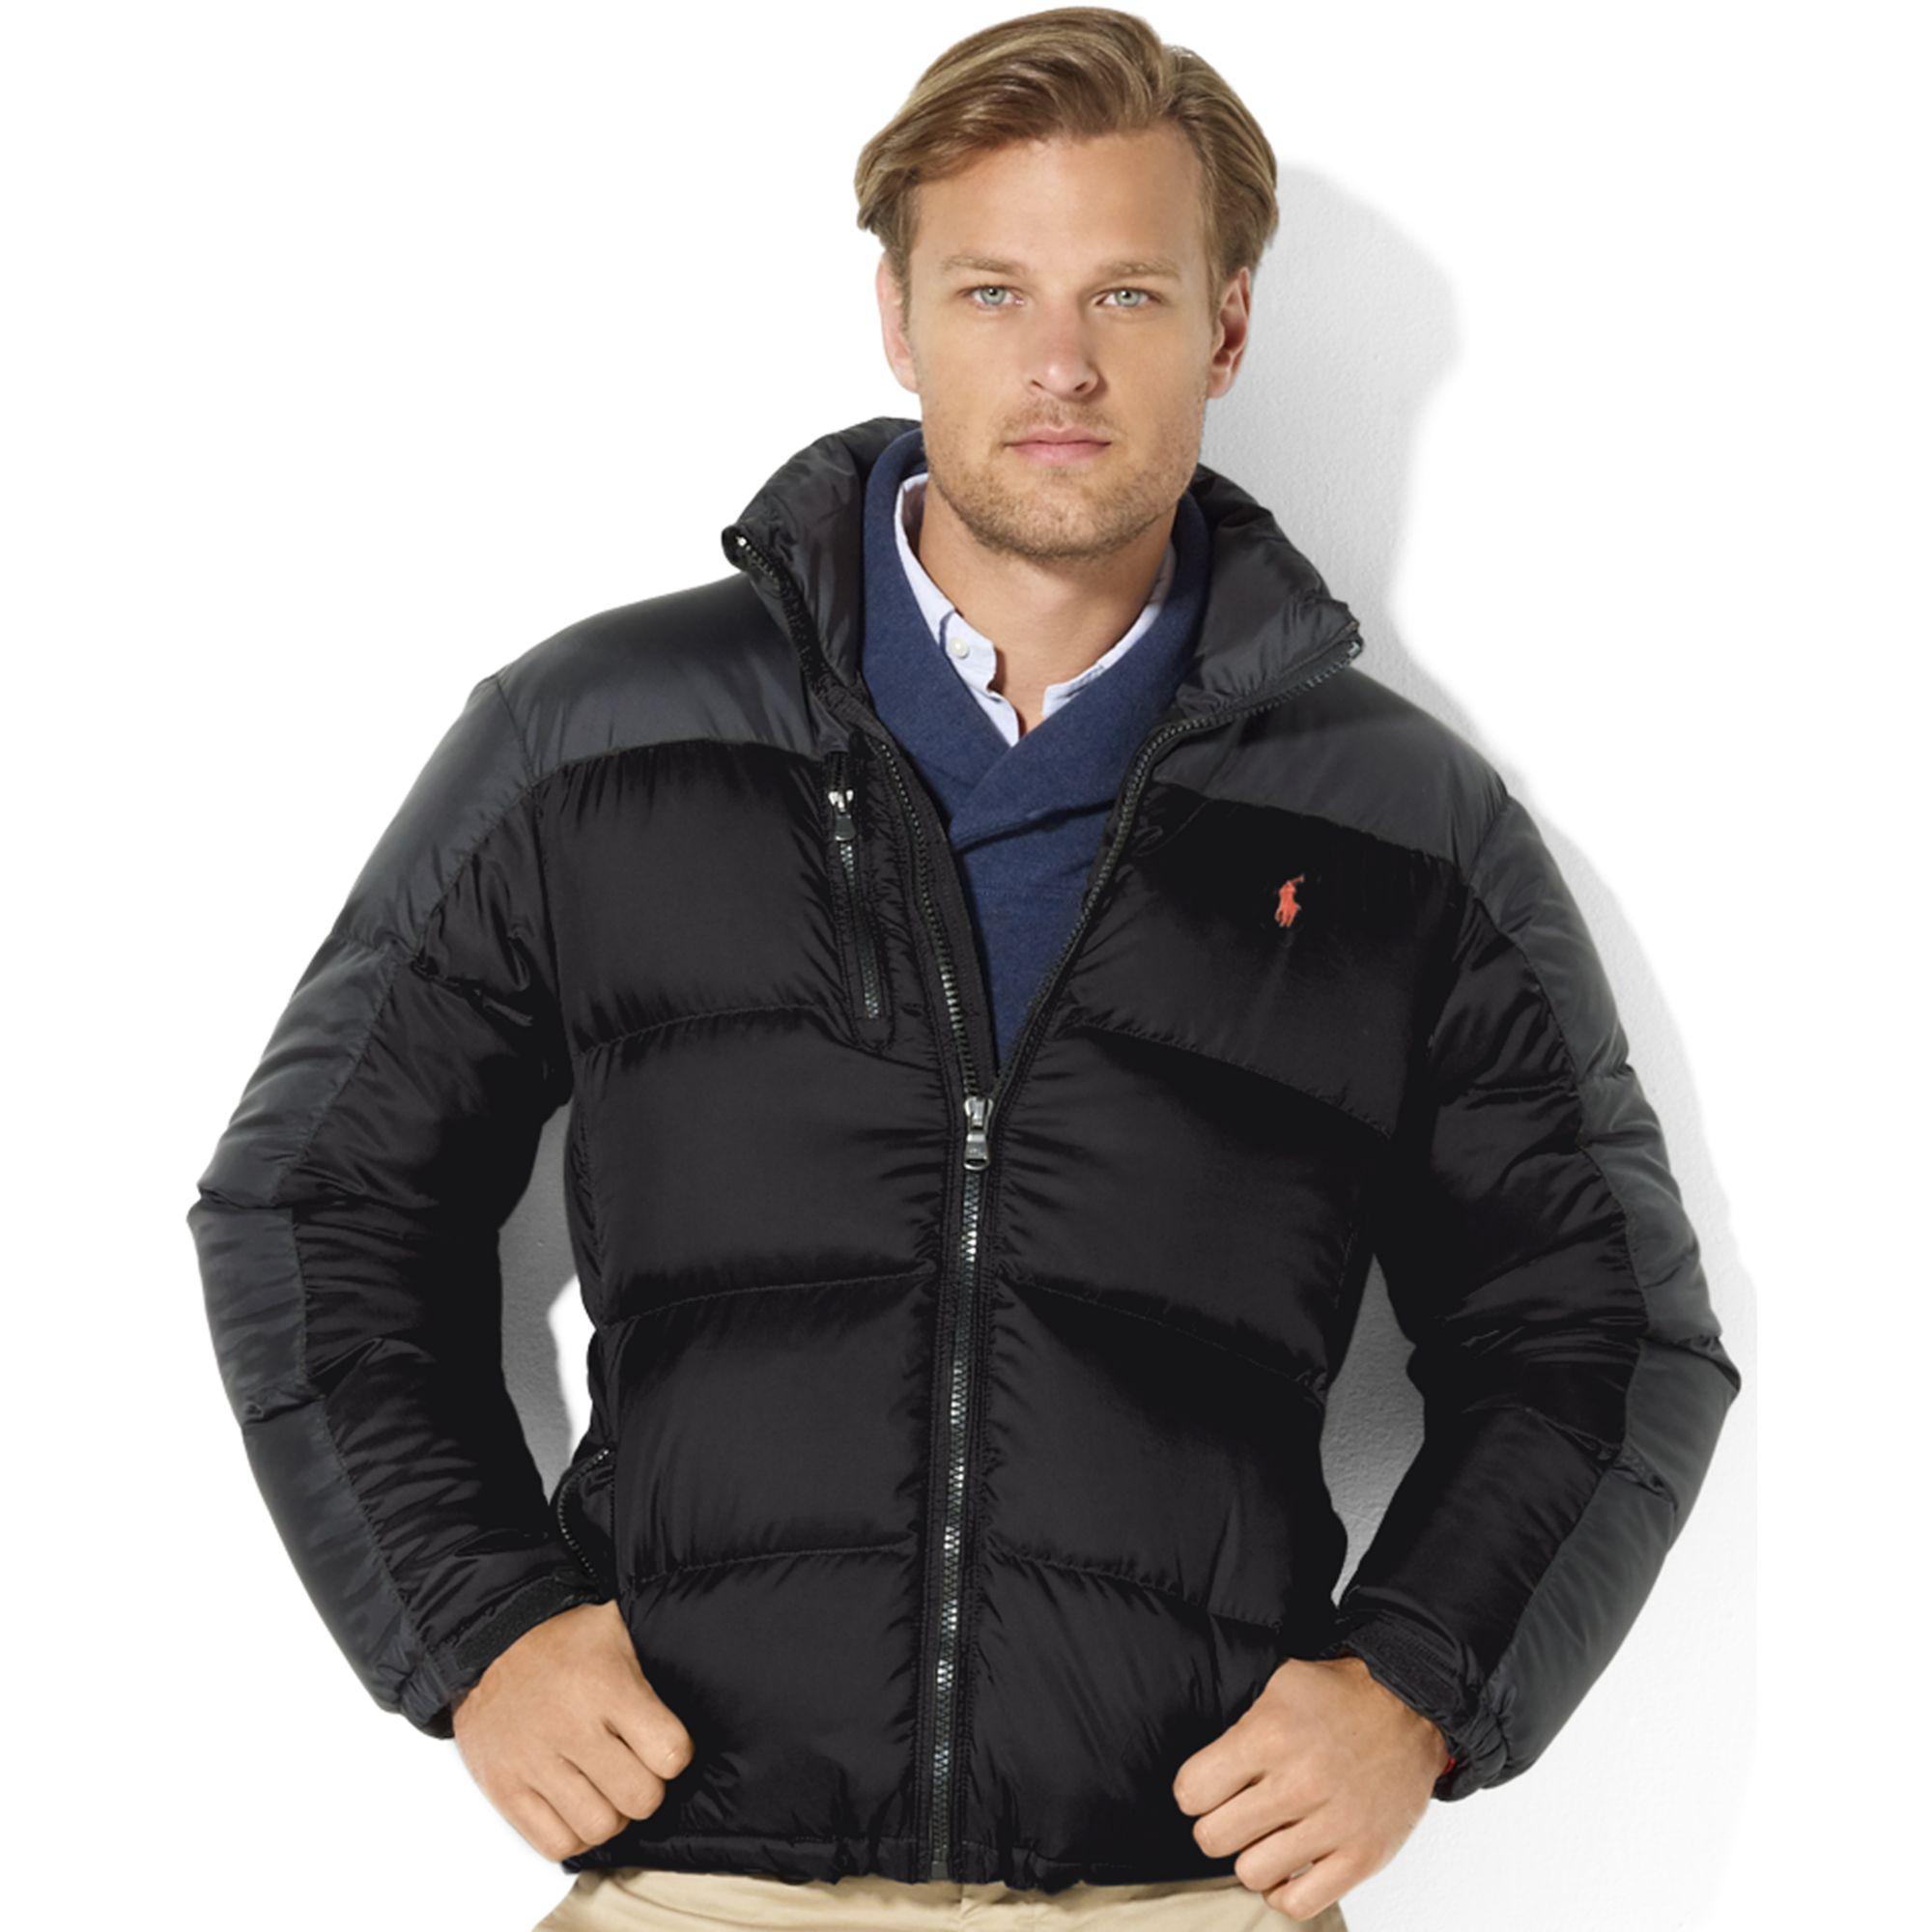 062ab8bf0ca Lyst - Ralph Lauren Snow Polo Core Trek Down Jacket in Black for Men